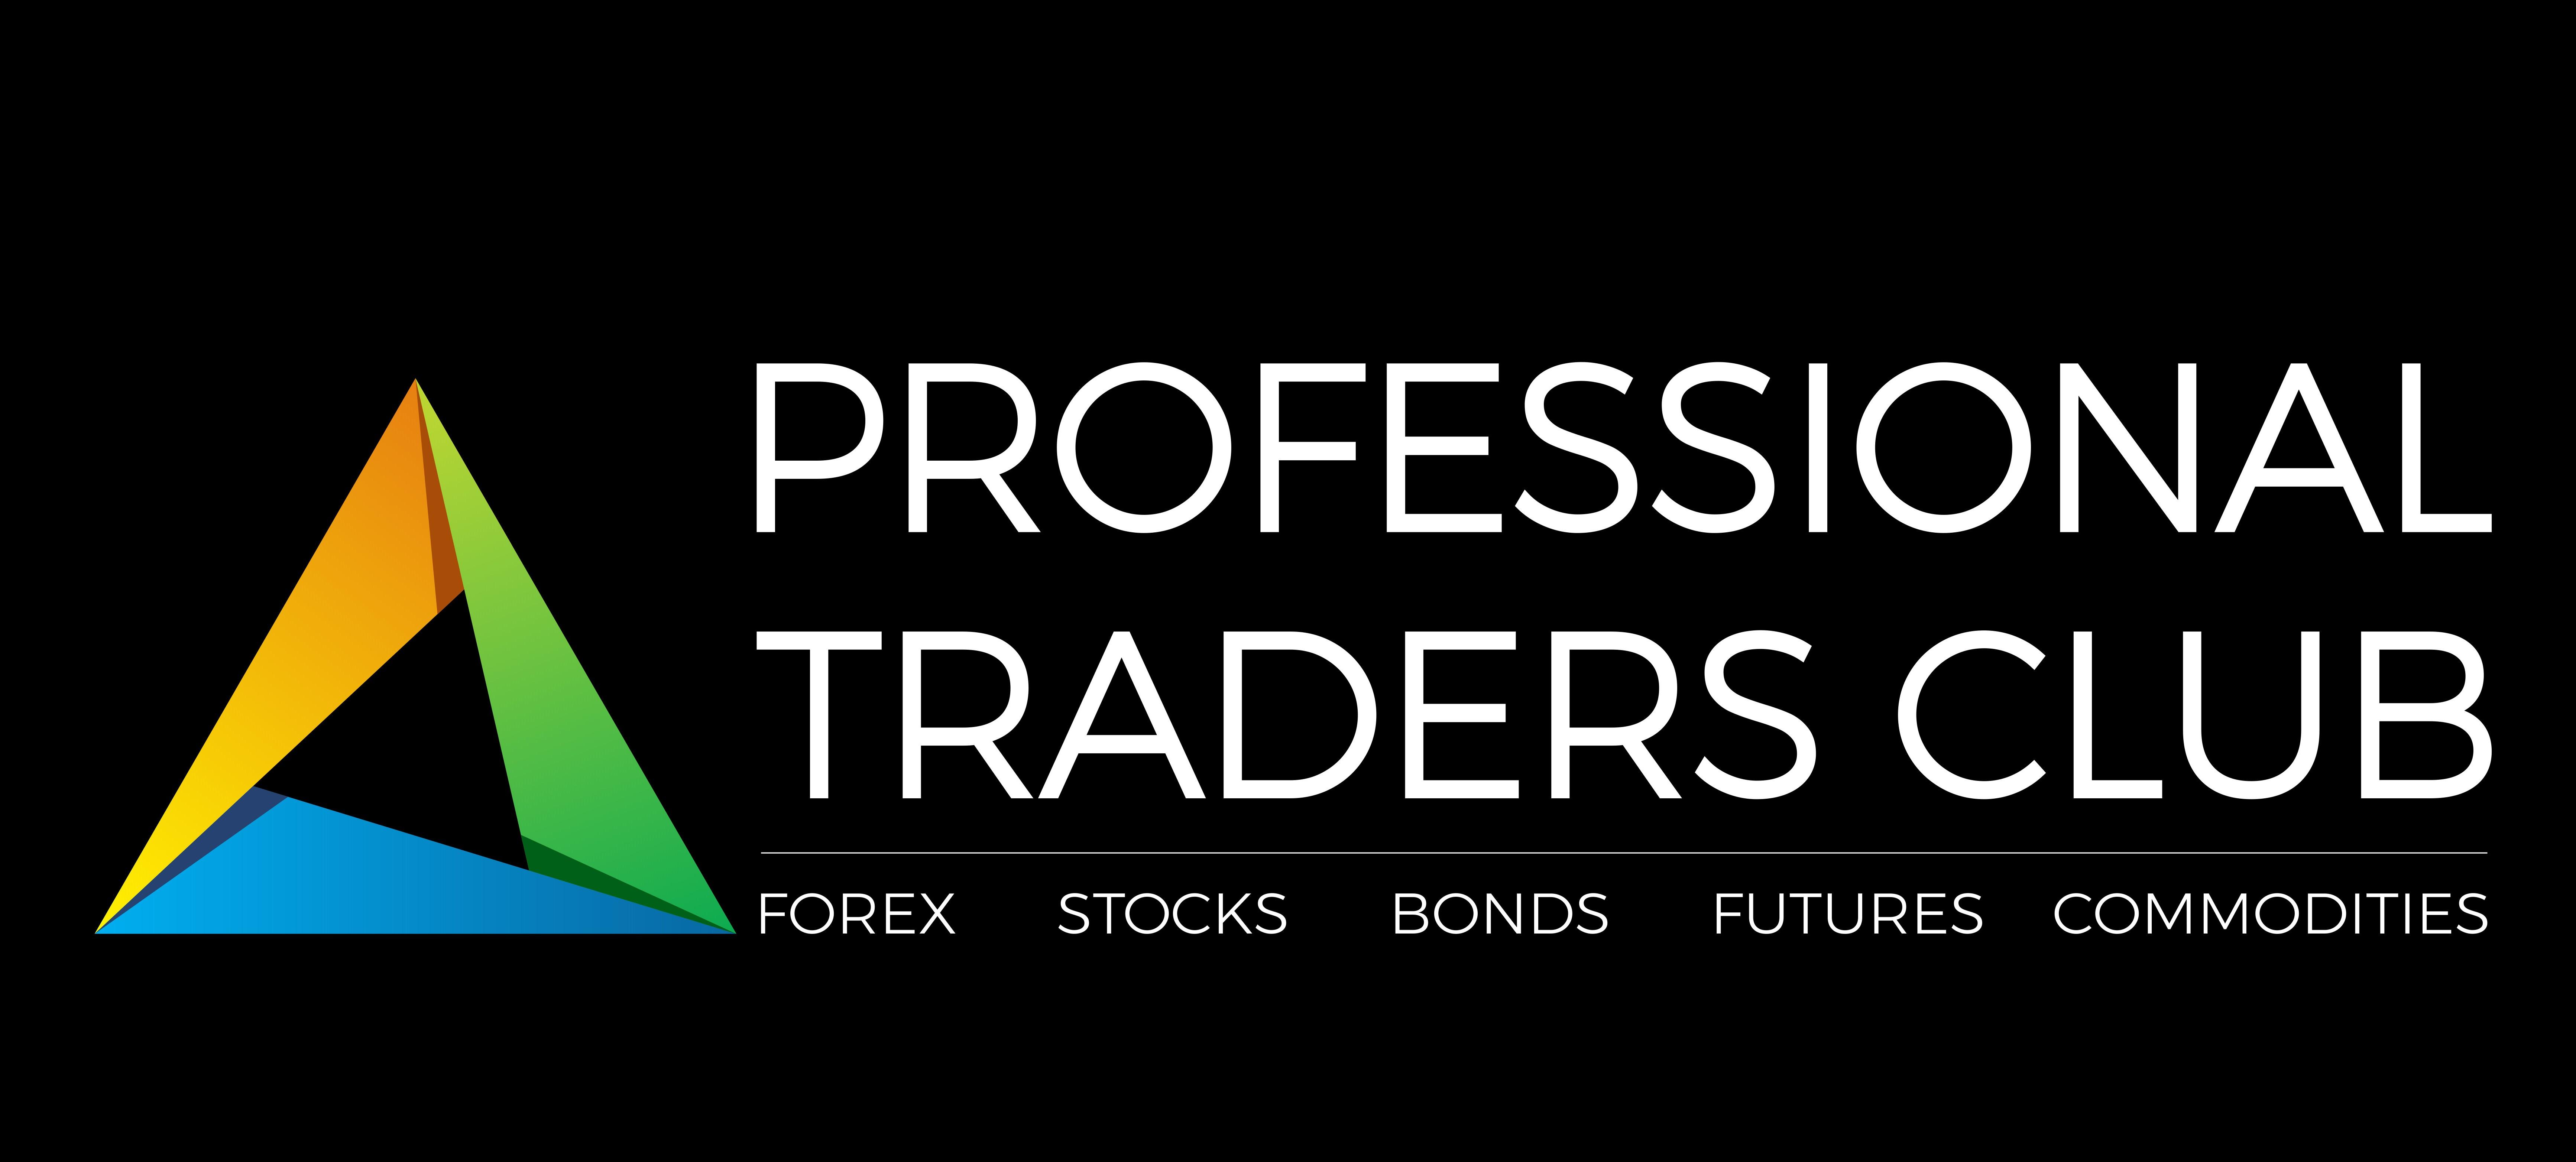 Professional Traders Club